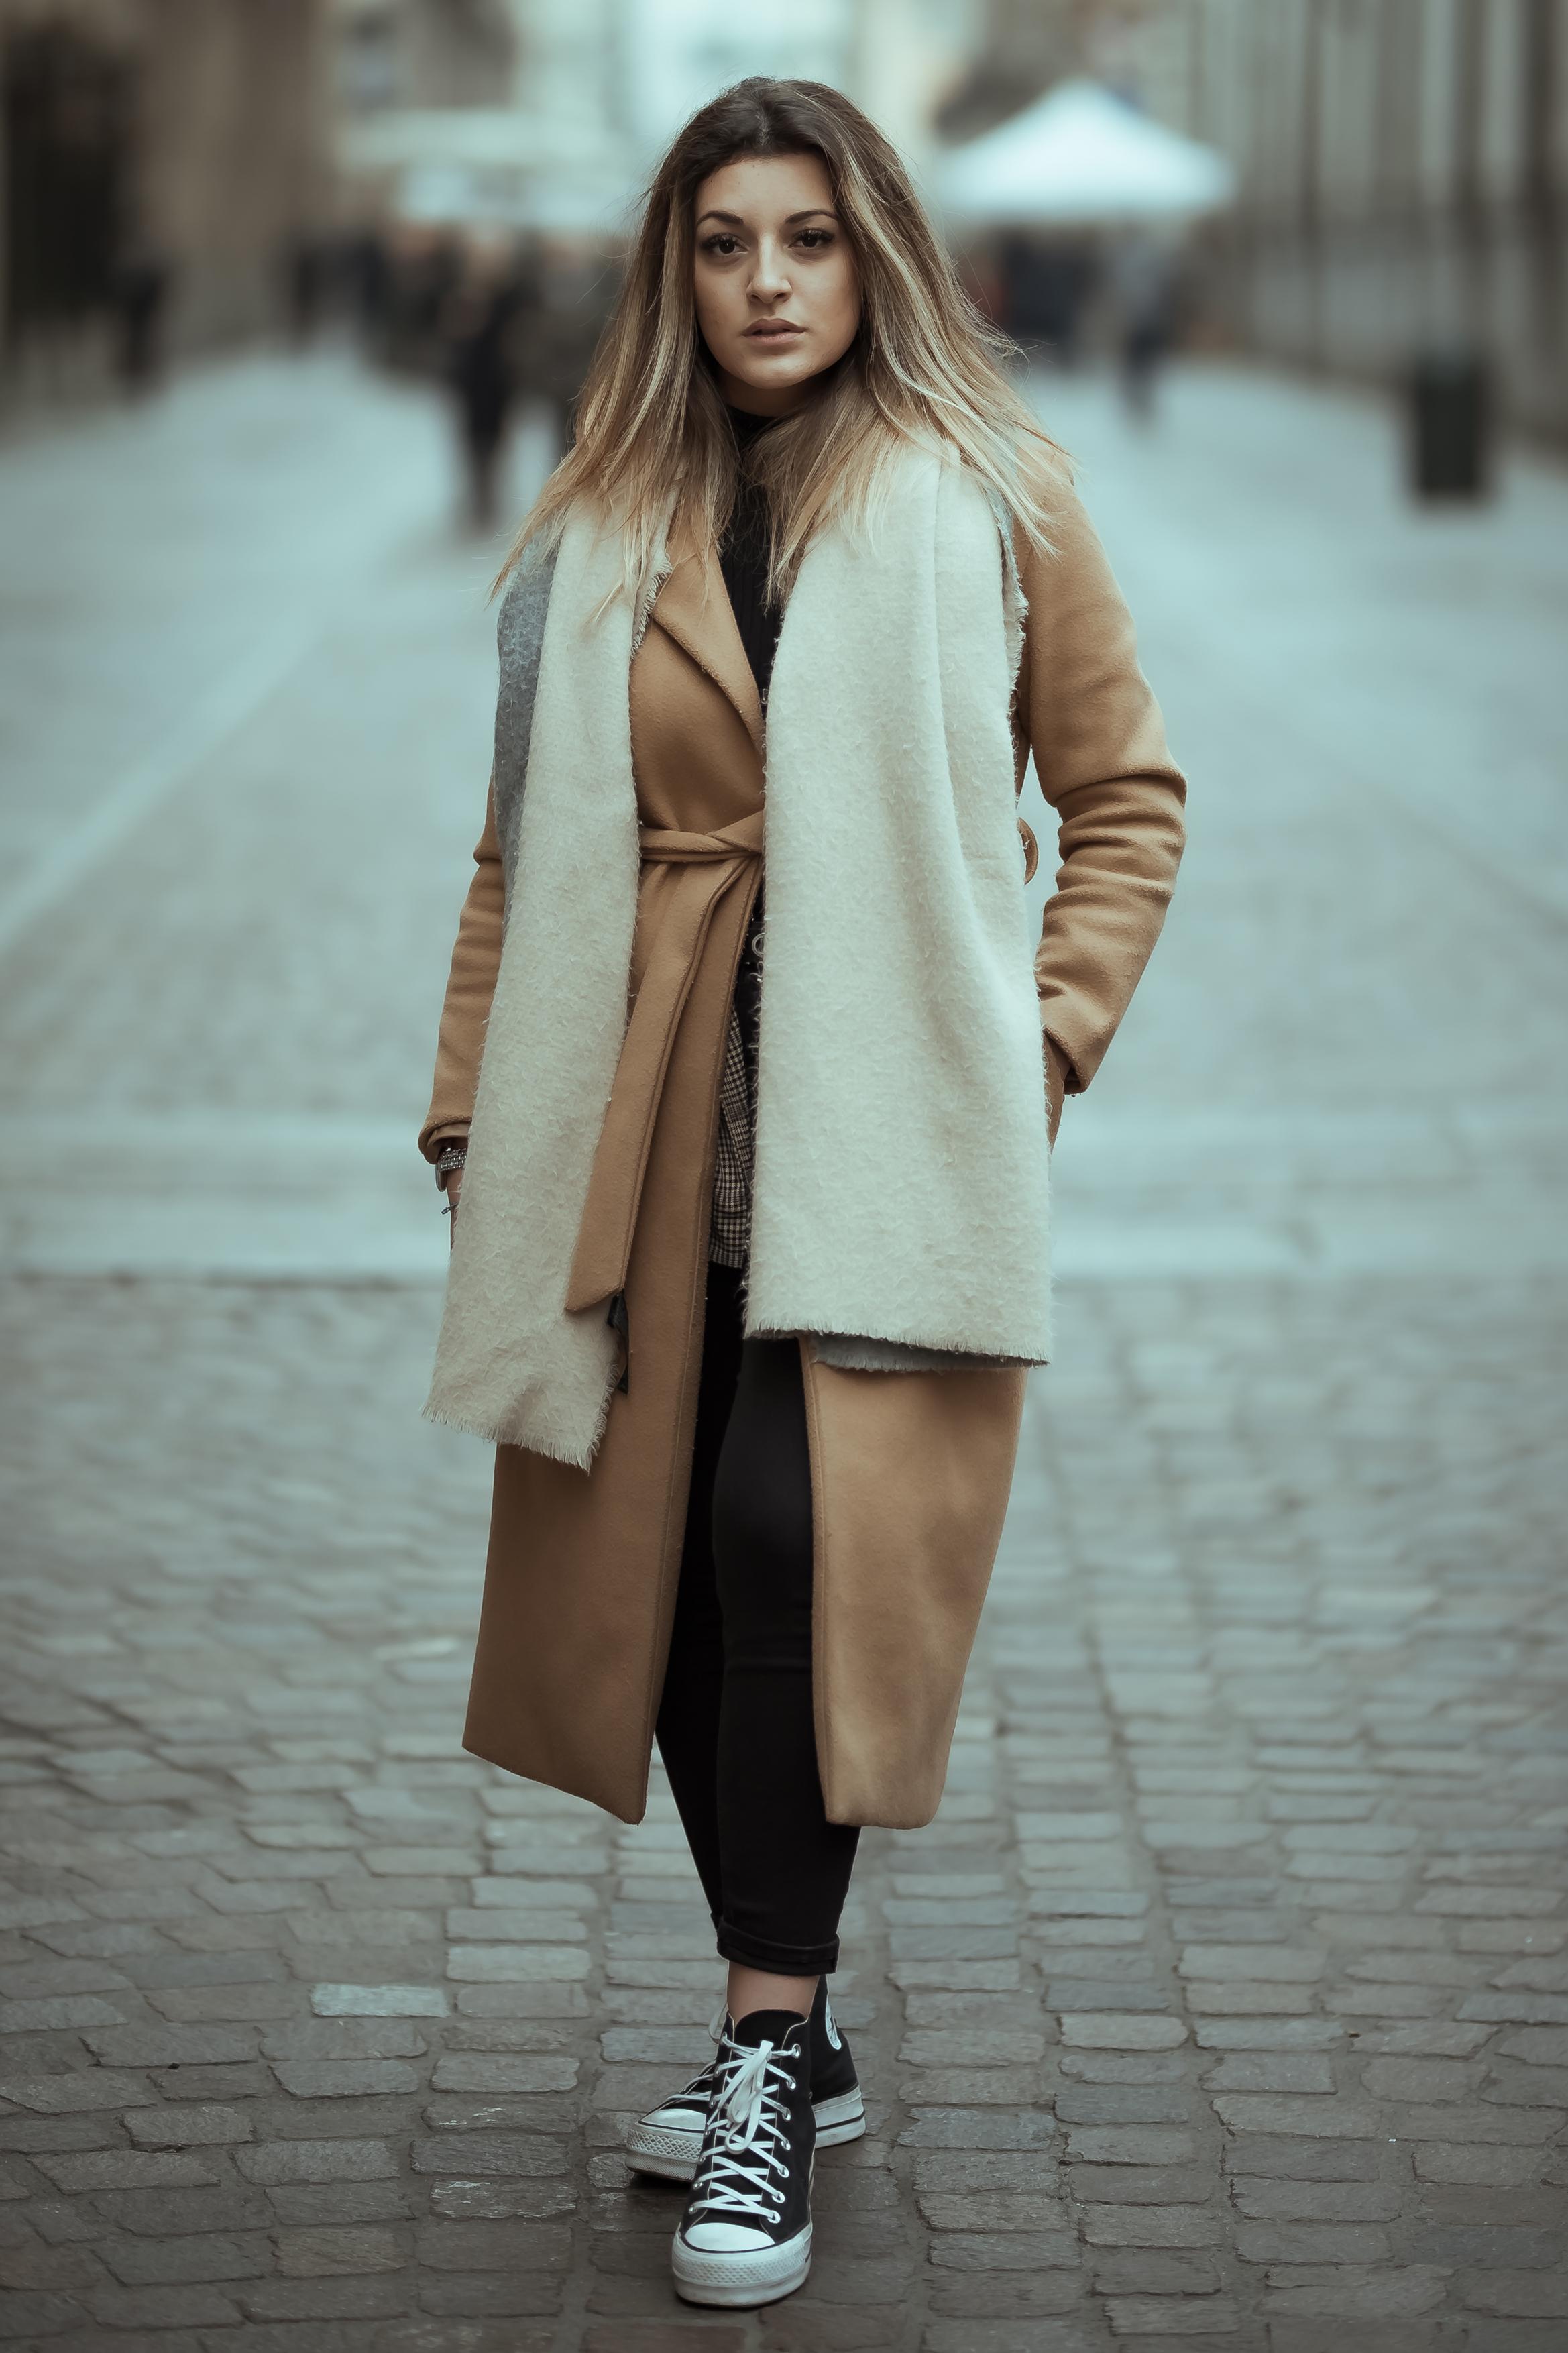 Model: Carola Treglia